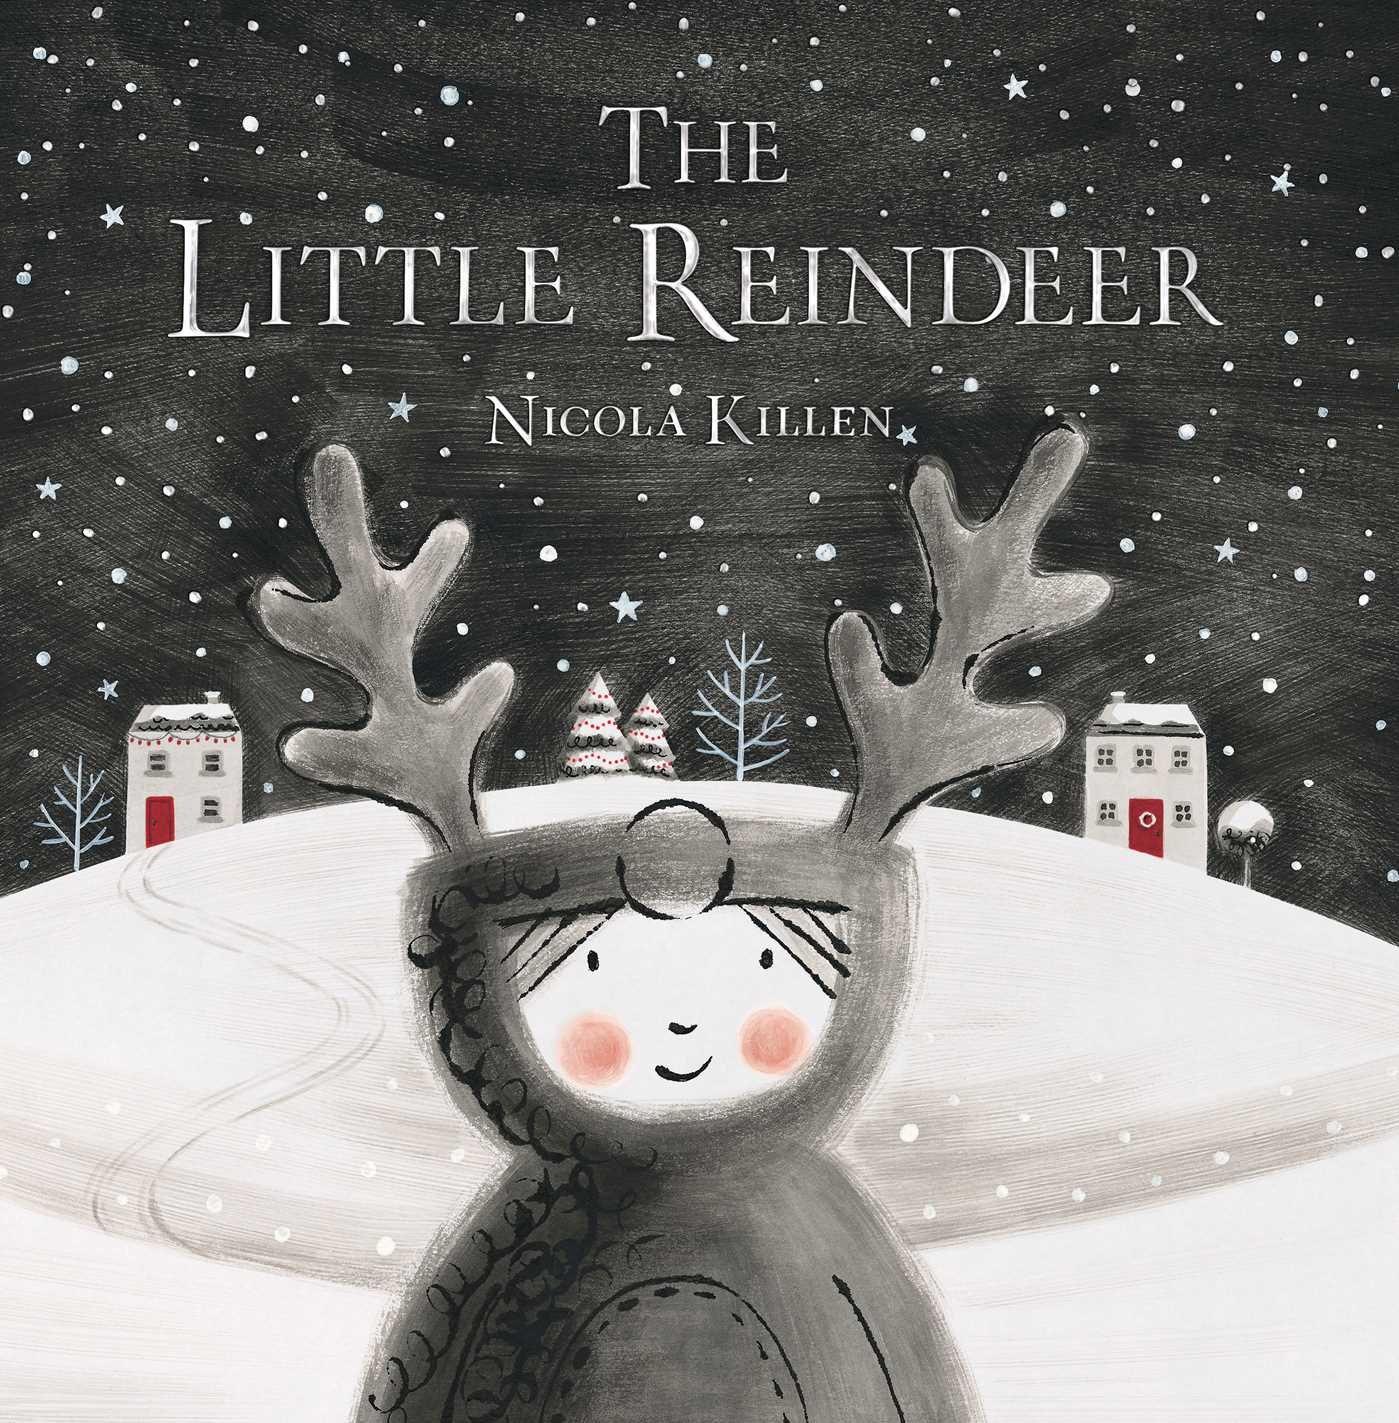 Amazon.com: The Little Reindeer (My Little Animal Friend) (9781481486866): Killen, Nicola, Killen, Nicola: Books